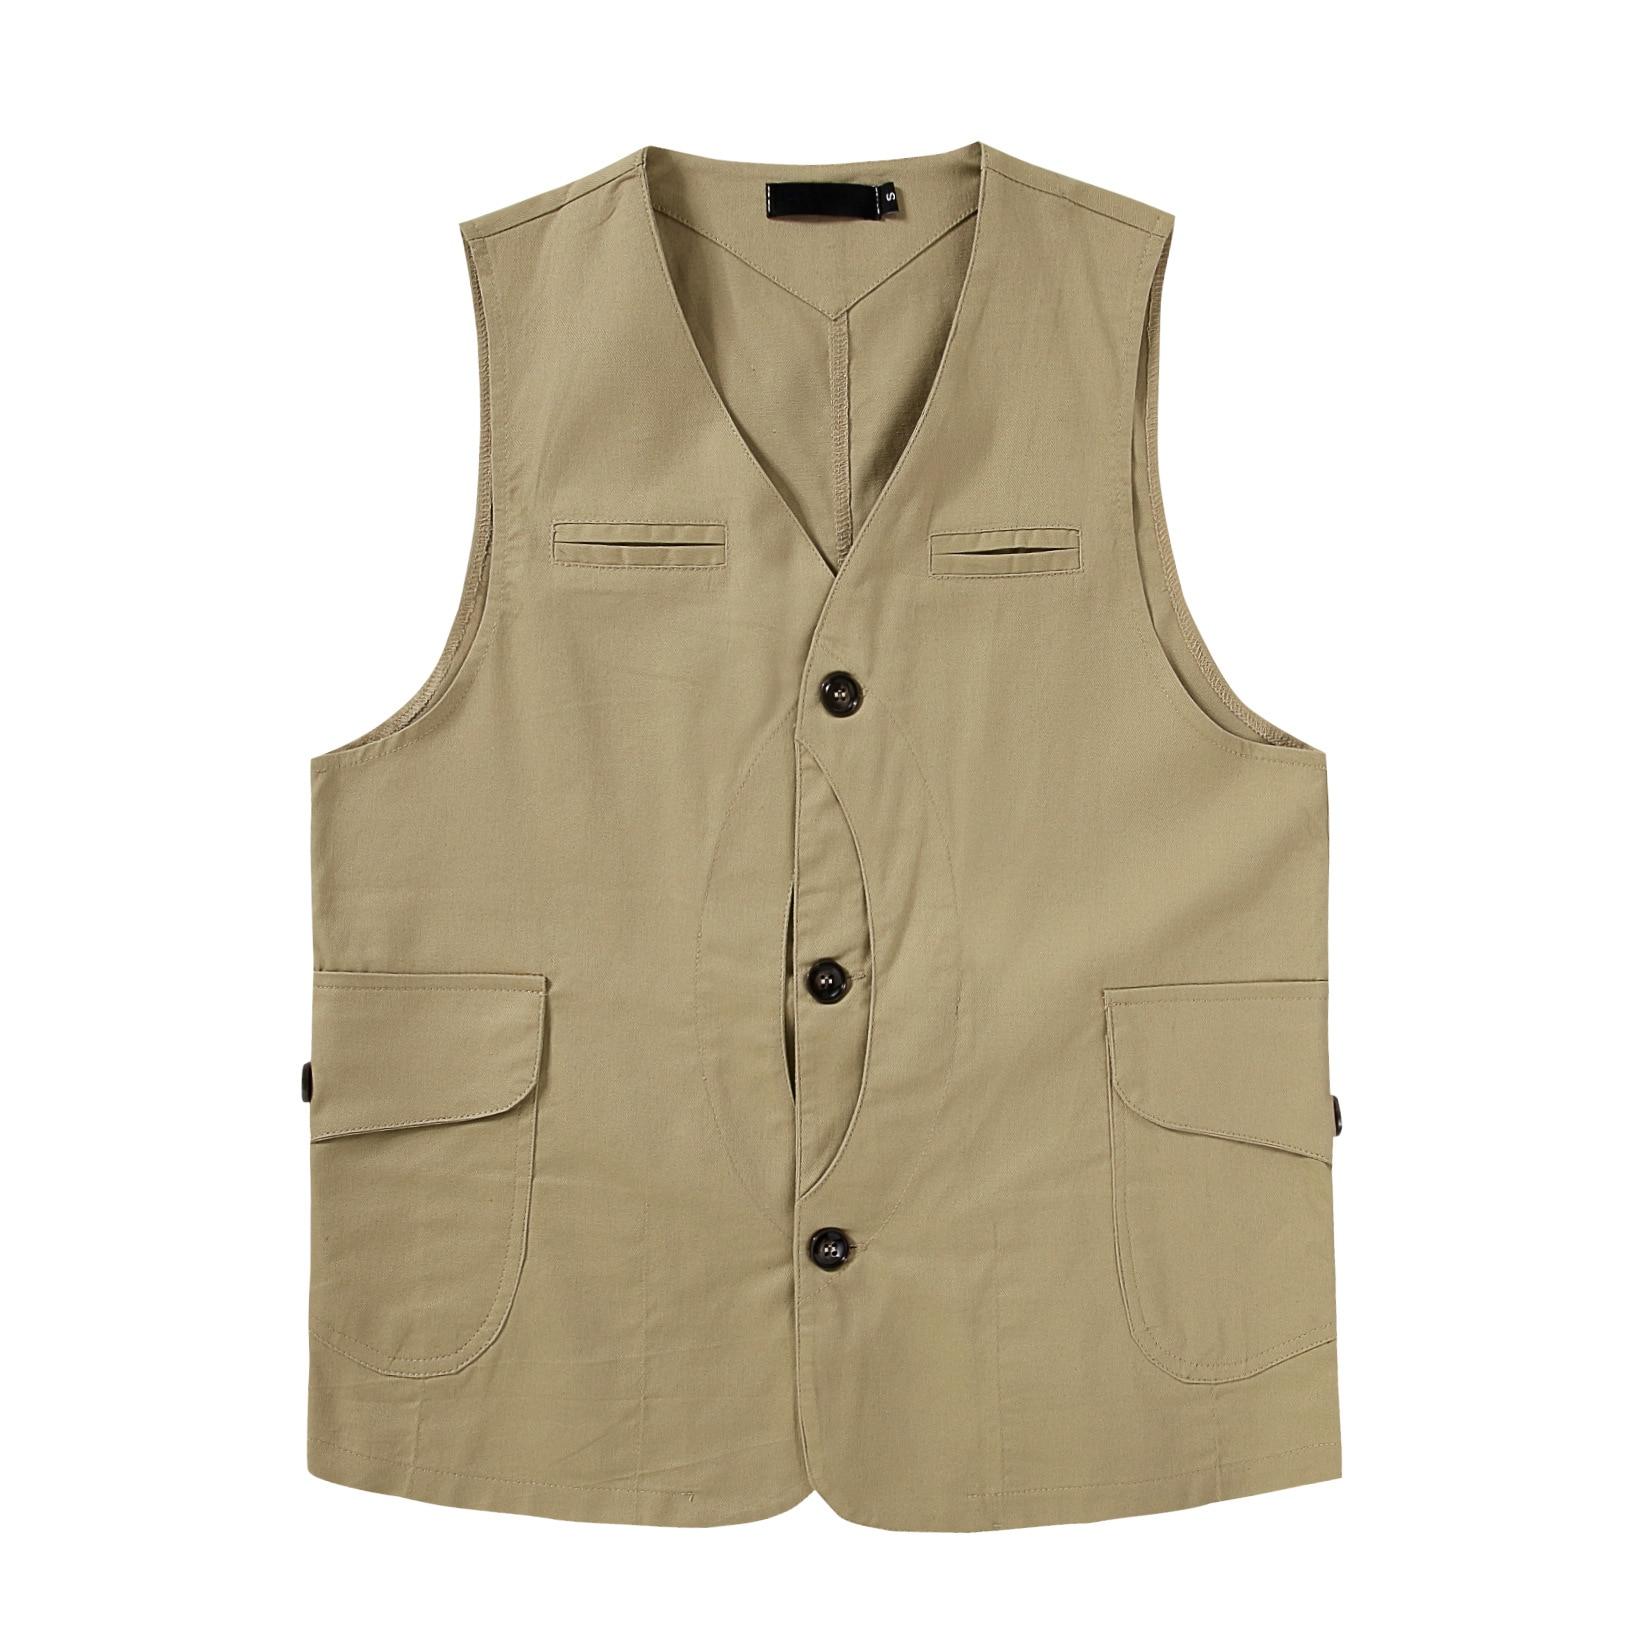 2020 Brand Men Casual Loose Vintage Vest Japan Amekaji Fashion Pocket Sleeveless Cargo Jacket Tops Waistcoat S-XXL